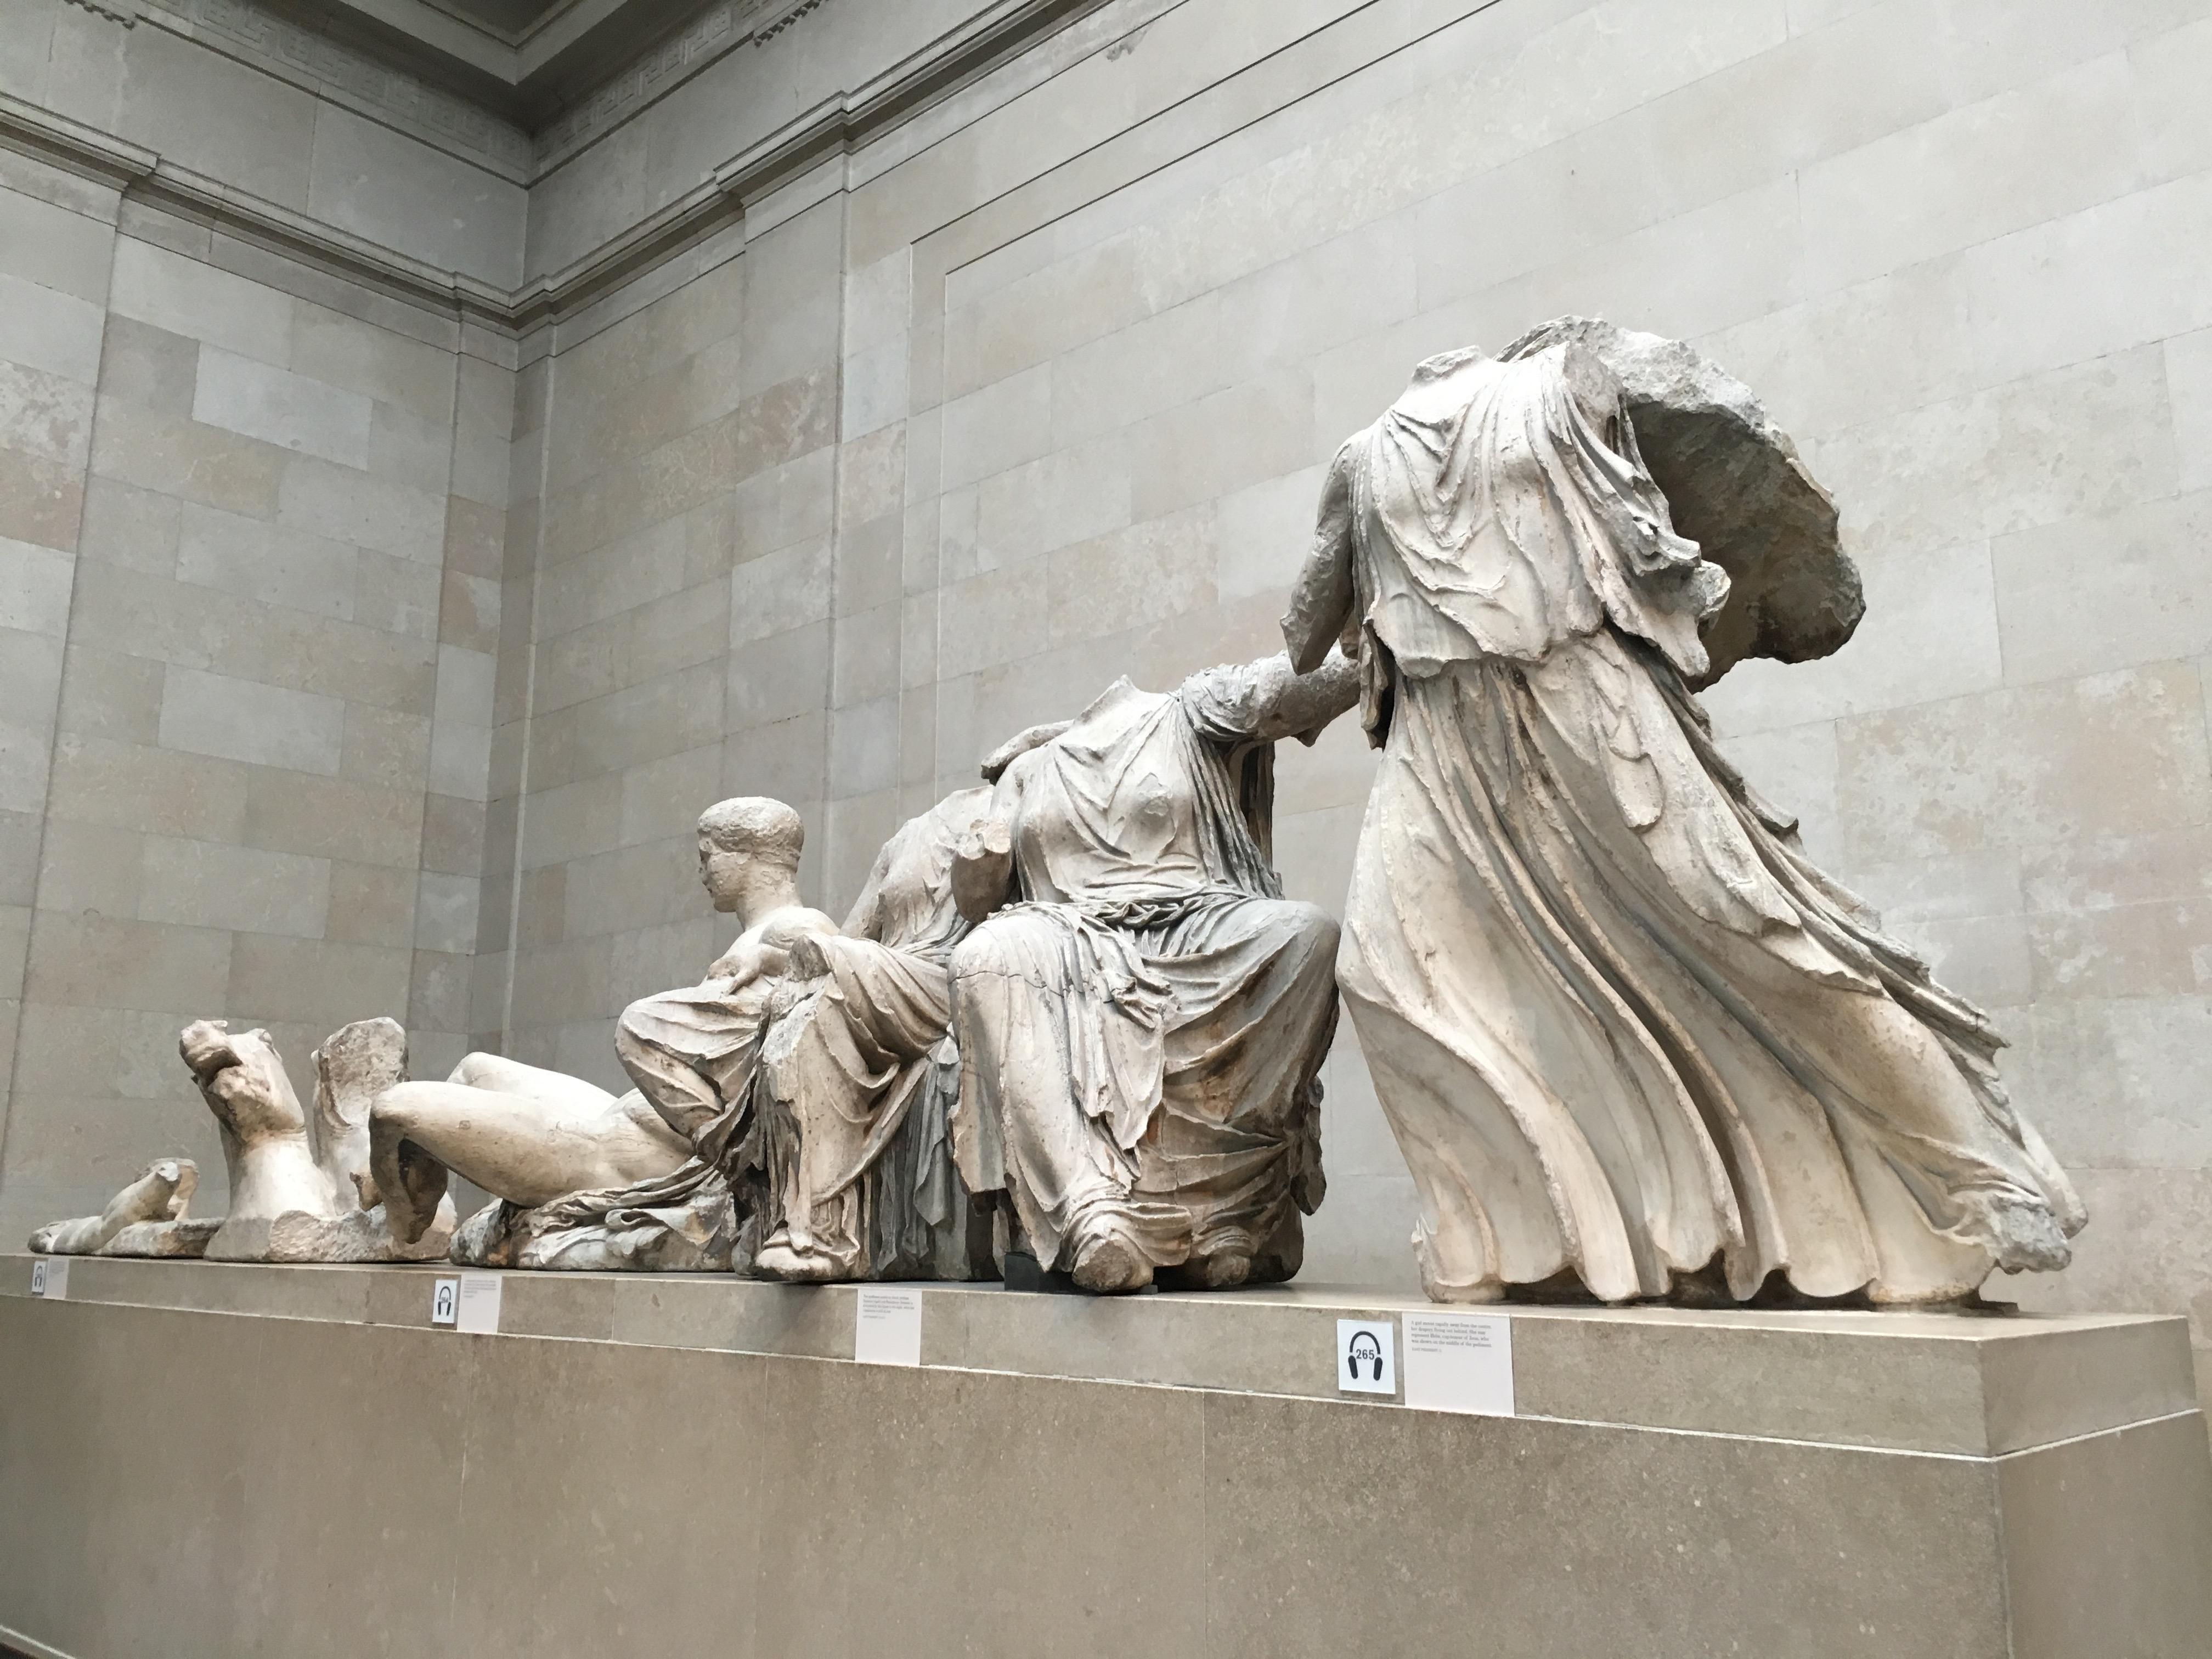 Ubuuq9xhwuqz Jpg 4032 3024 Elgin Marbles British Museum Parthenon